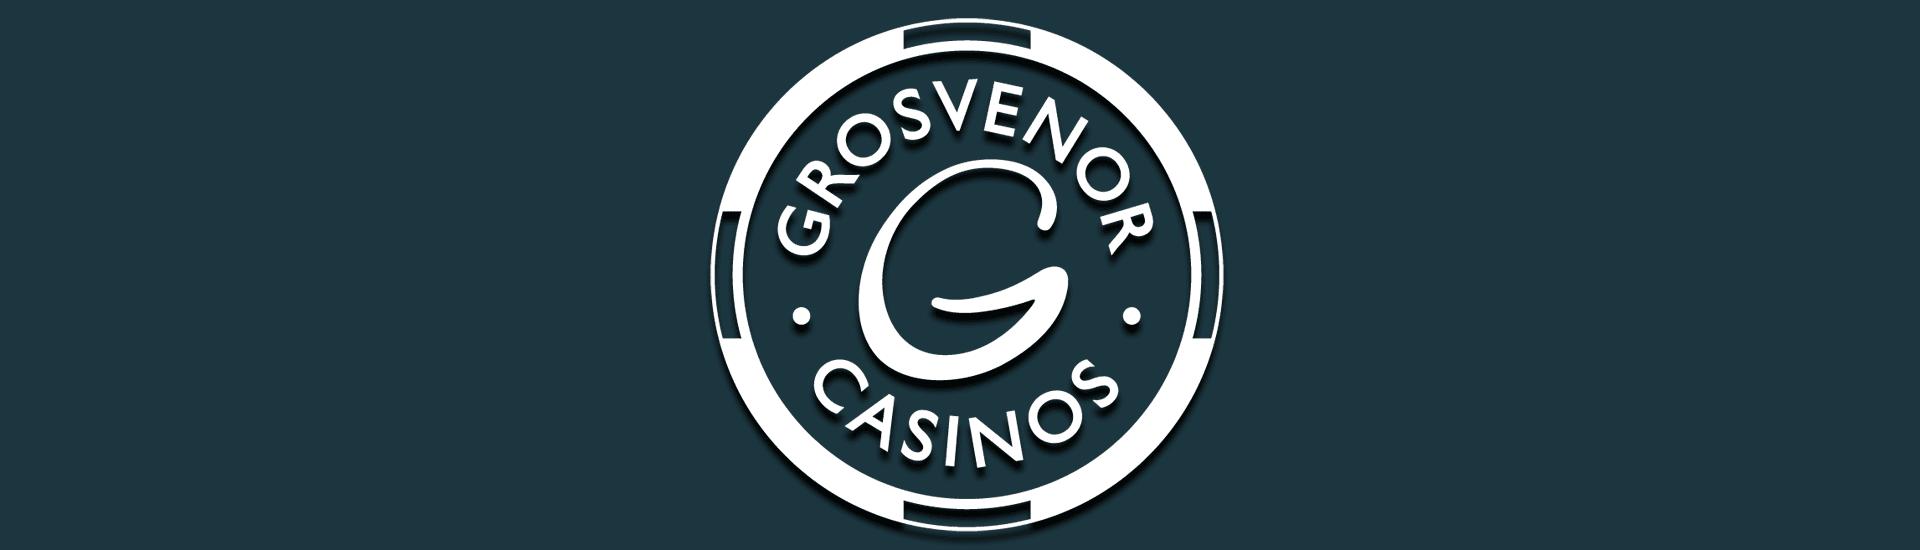 Grosvenor Casino Featured Image